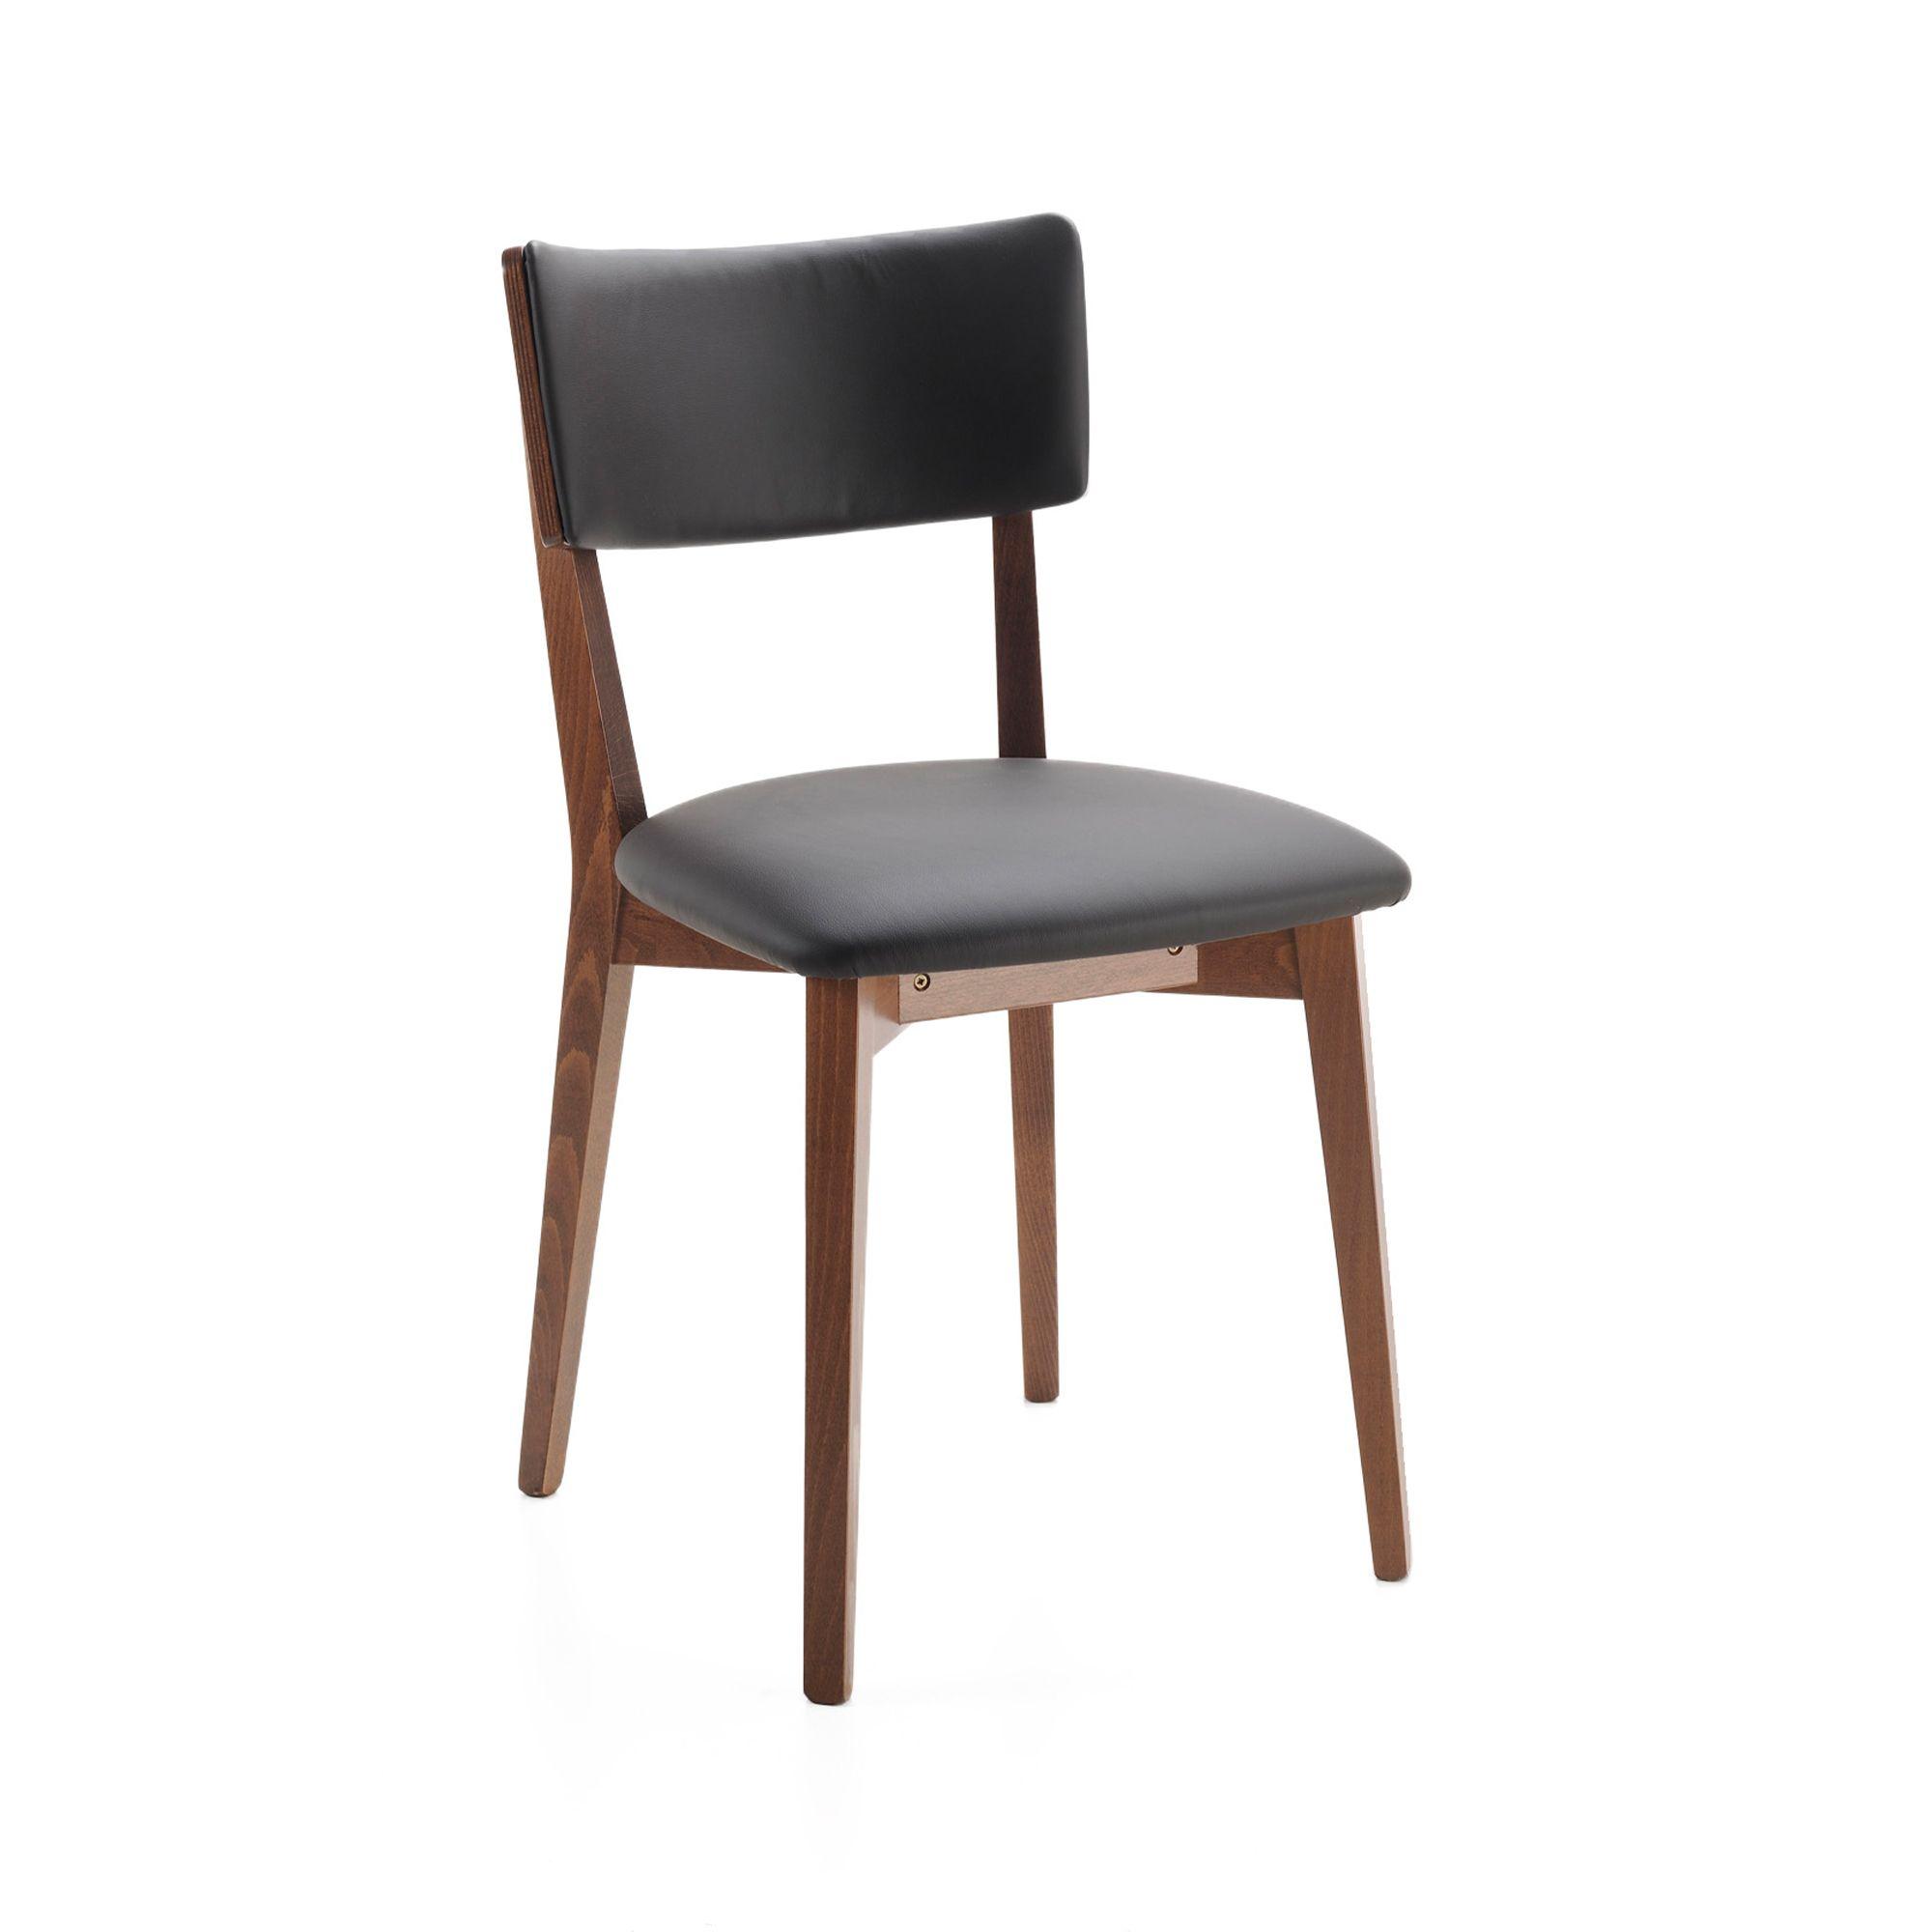 Sedia in stile moderno modello 869